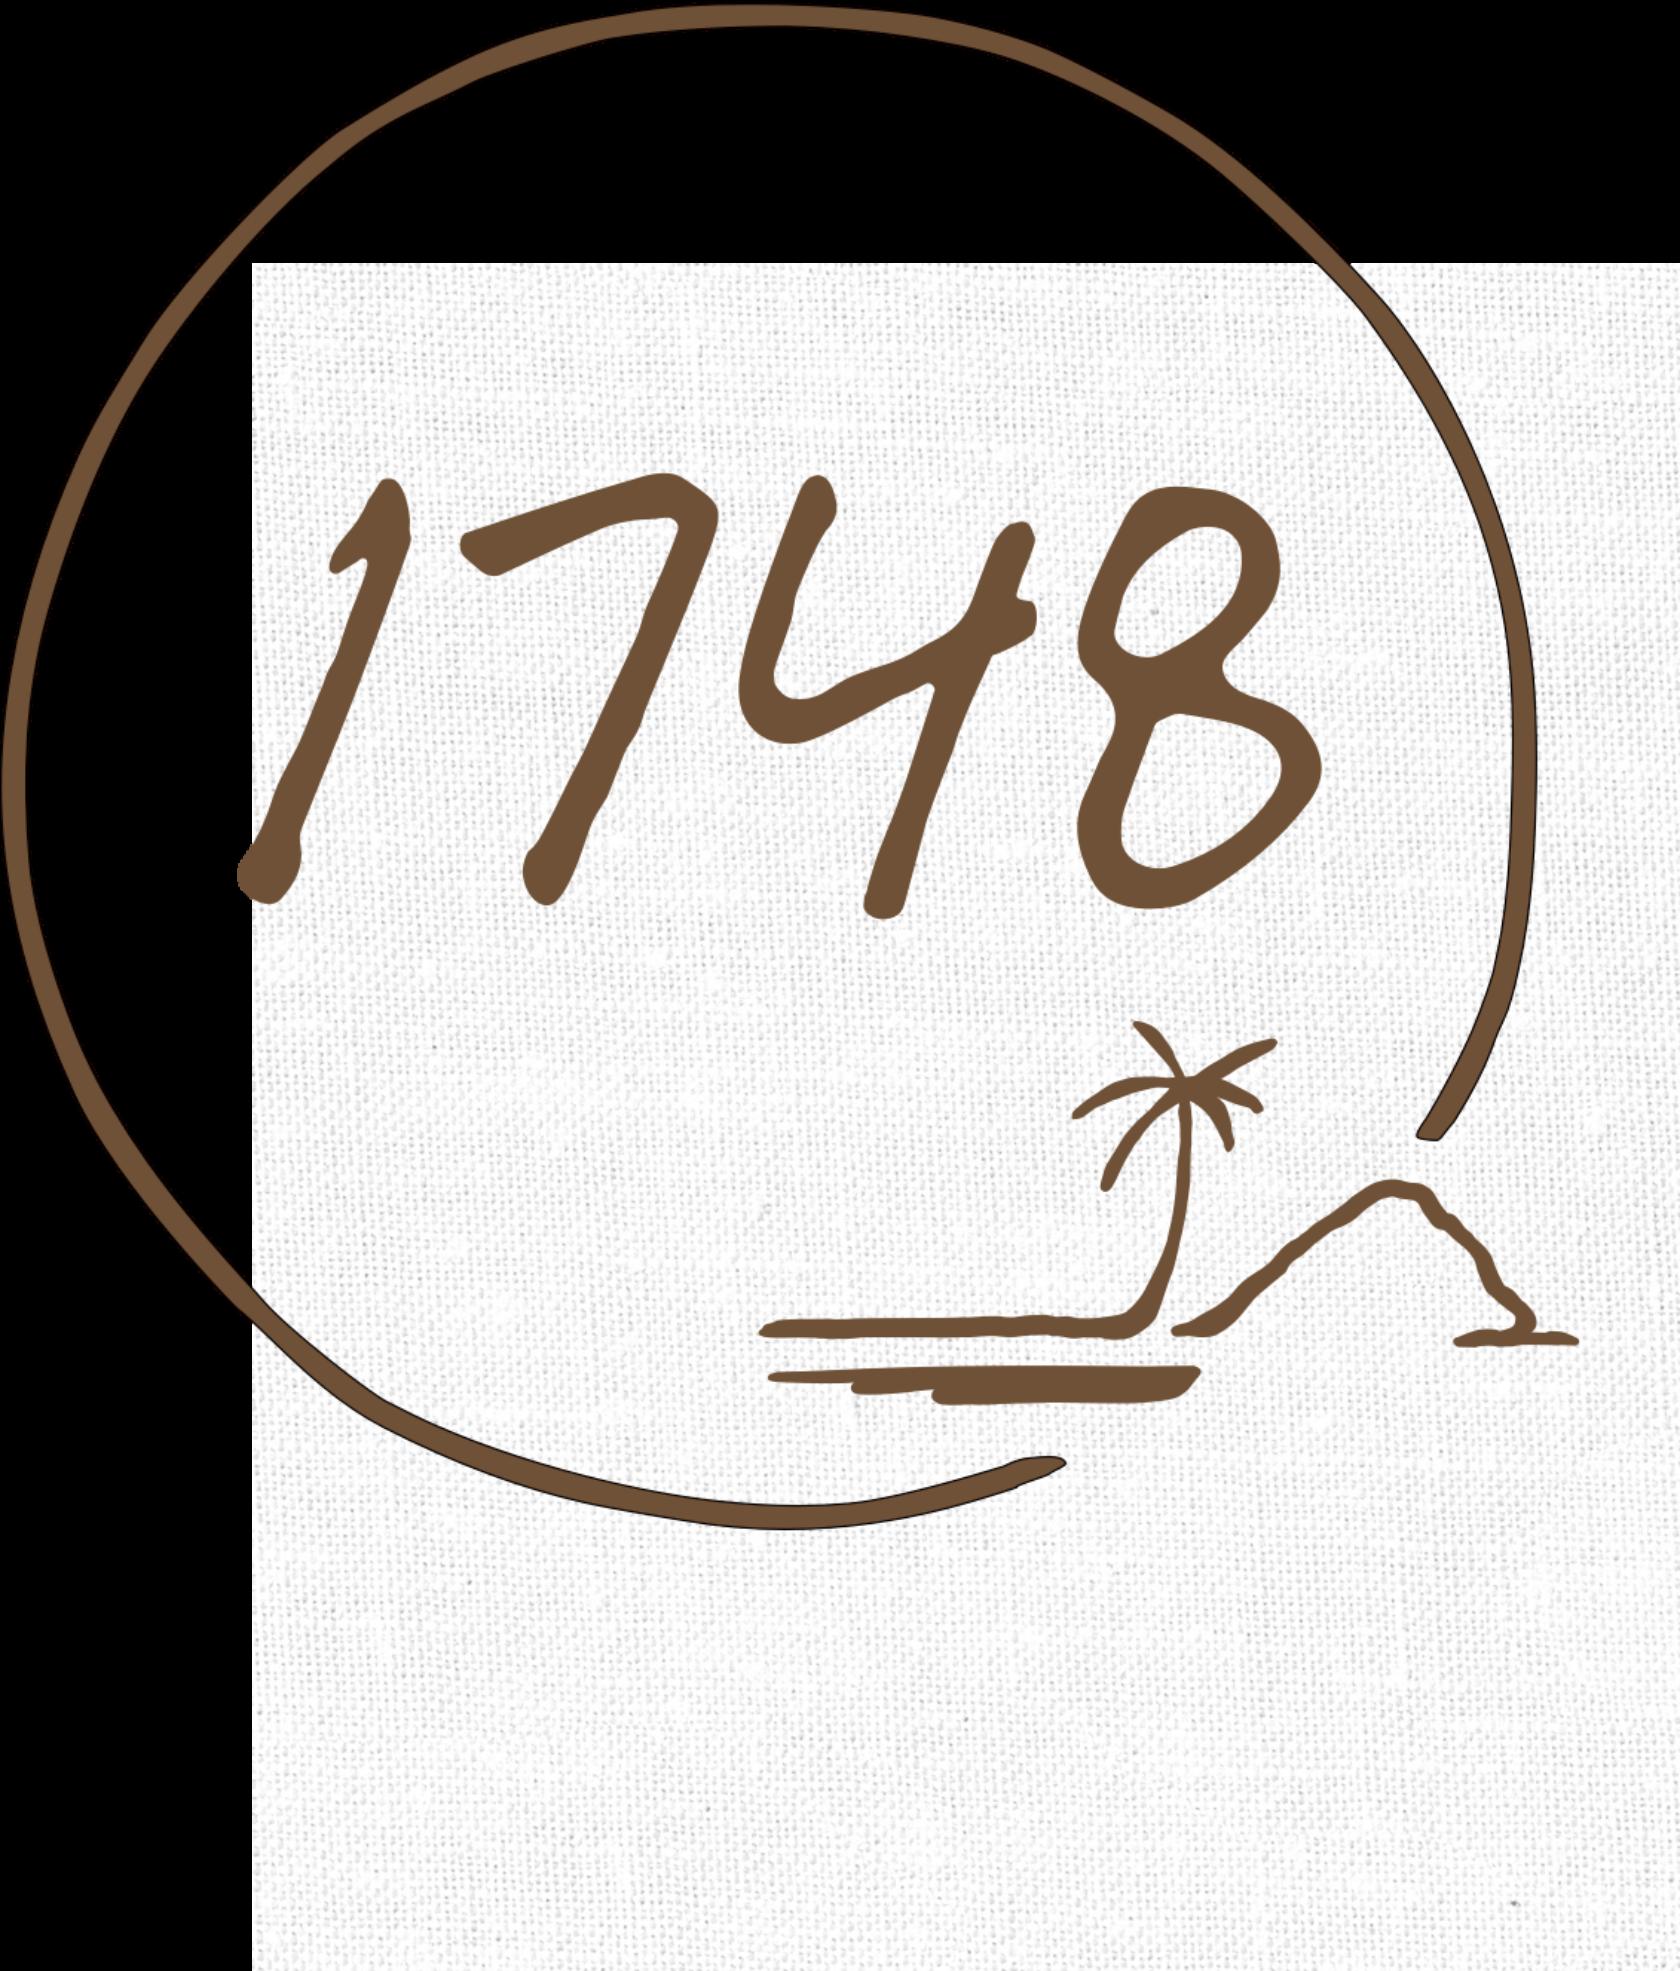 1748 restaurant